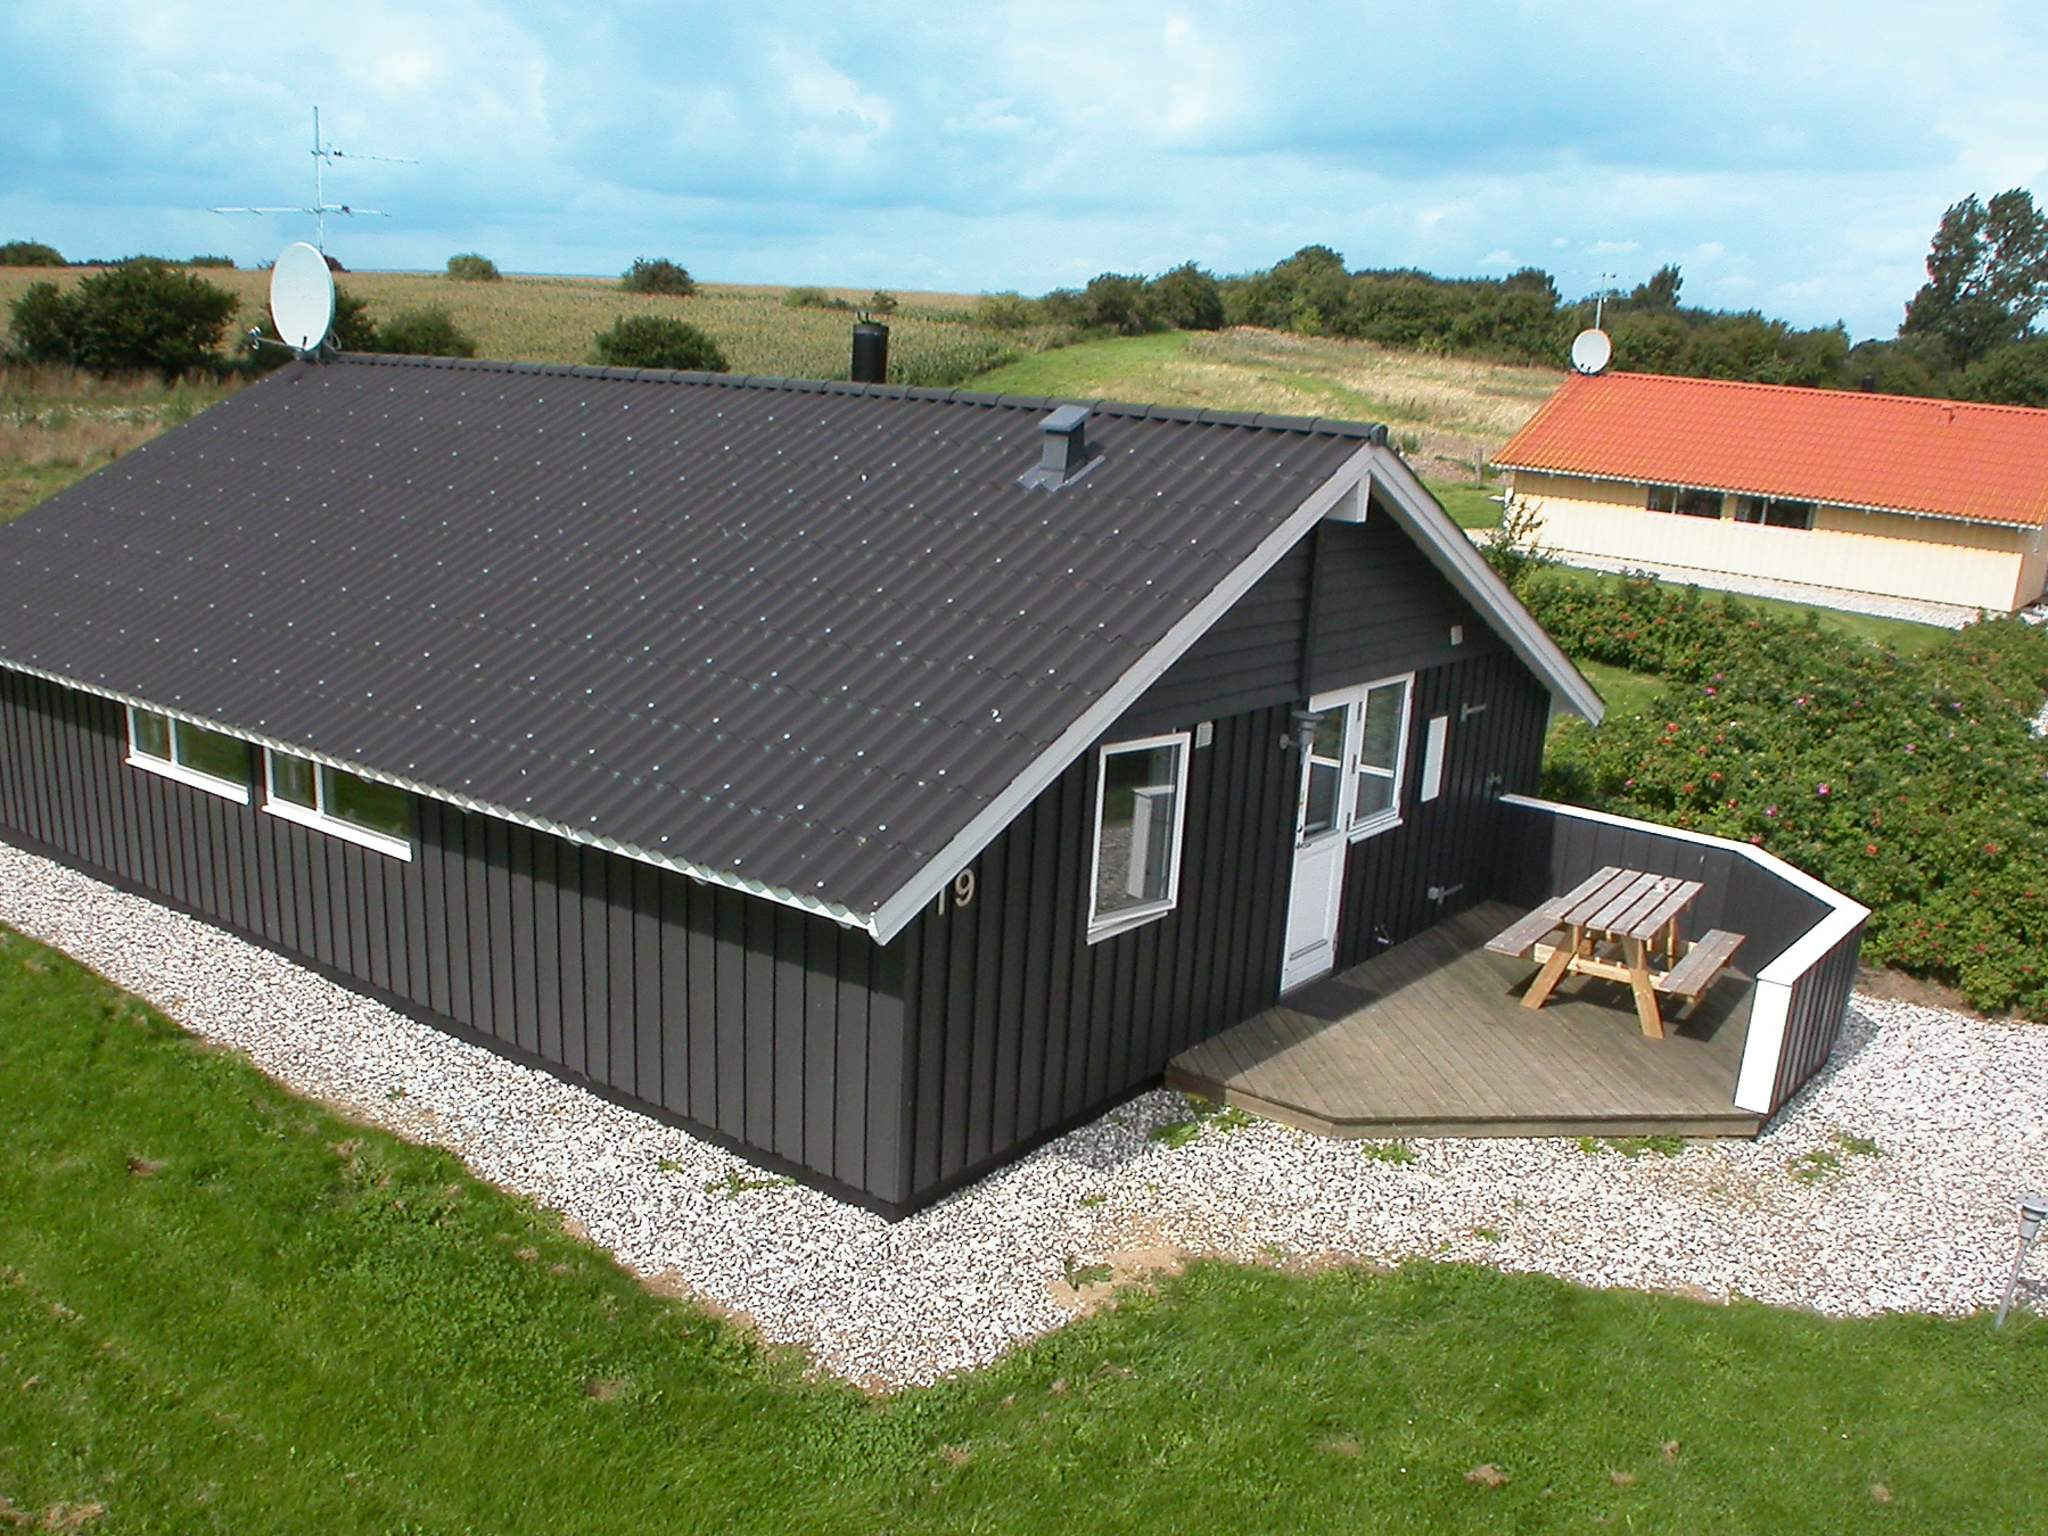 Ferienhaus Mørkholt (82537), Mørkholt, , Ostjütland, Dänemark, Bild 1